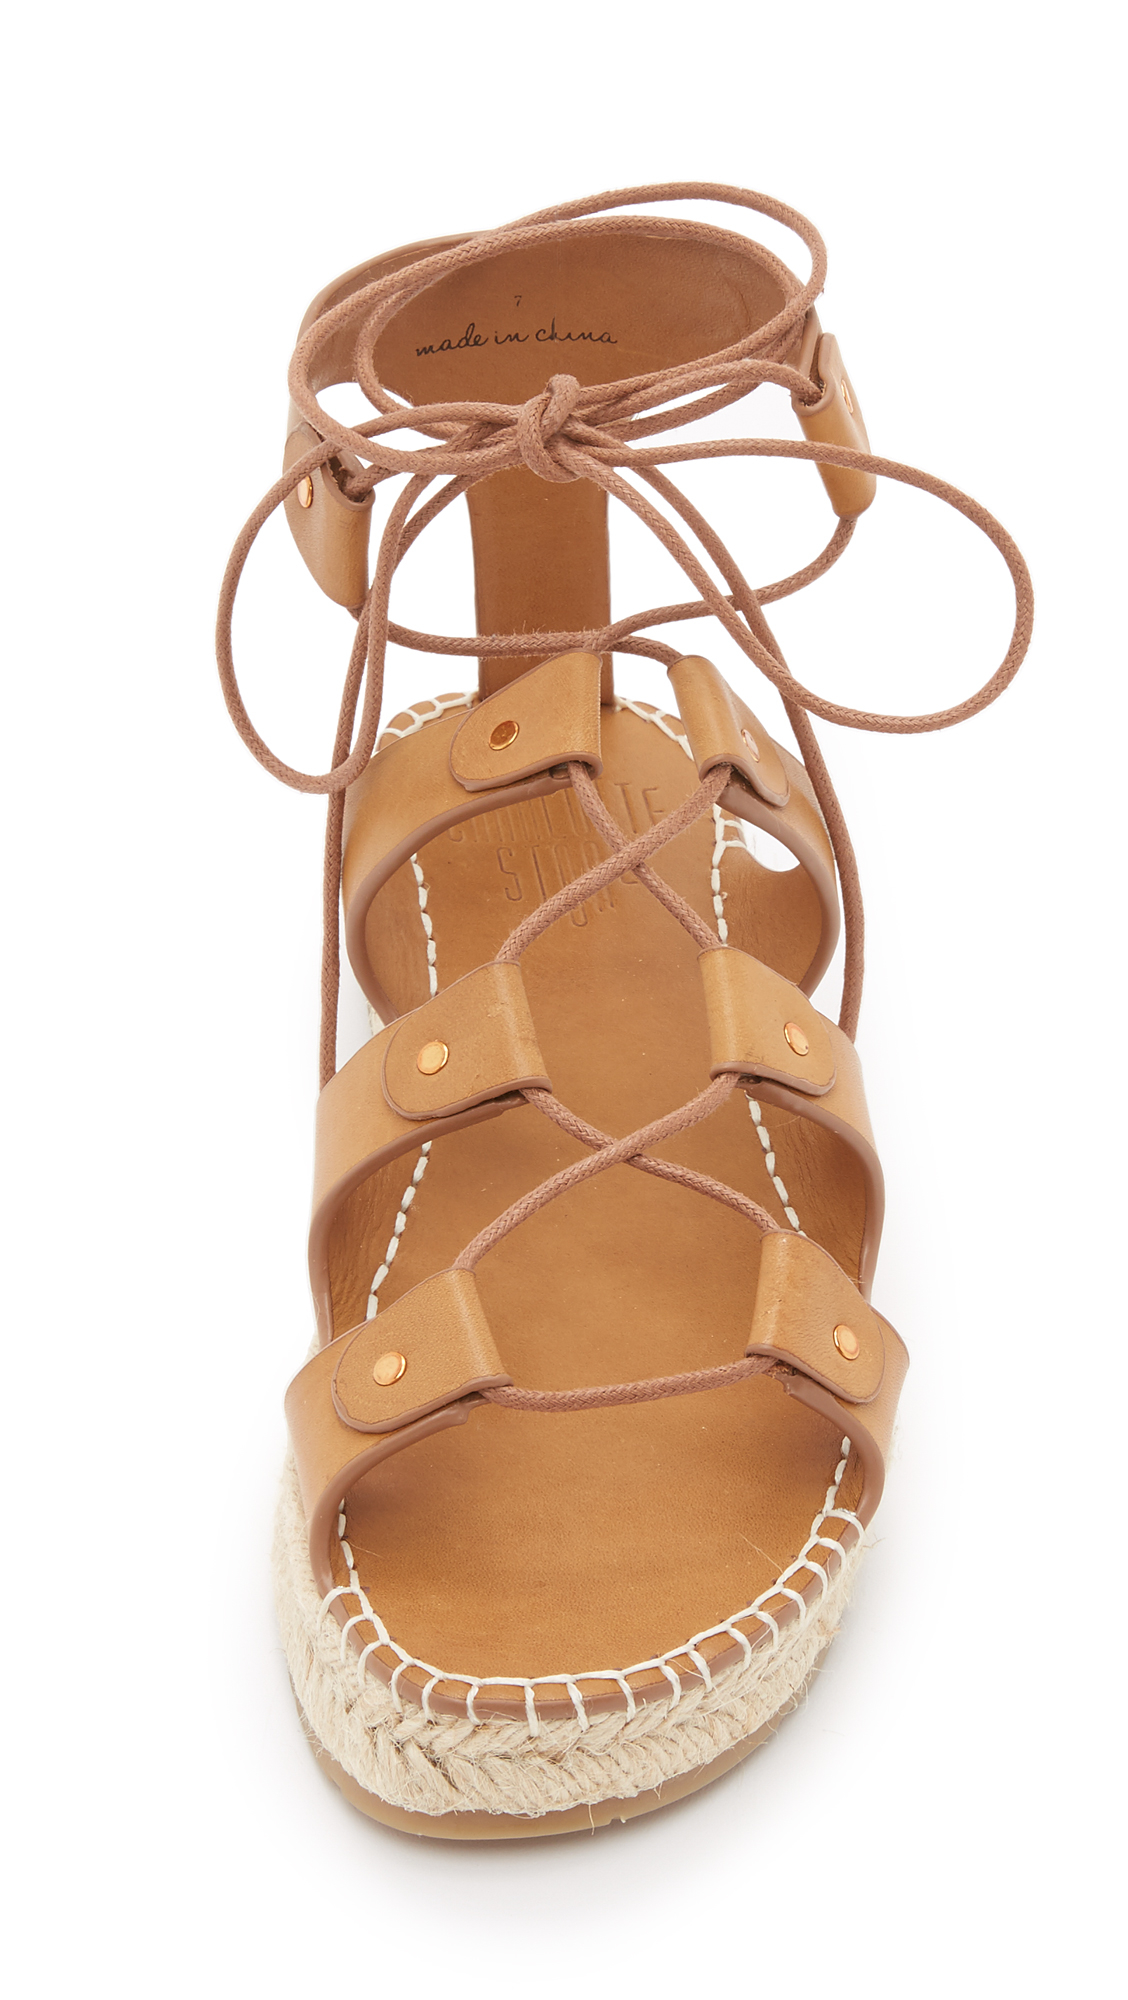 Lyst - Charlotte Stone Joni Espadrille Gladiator Sandals -2157